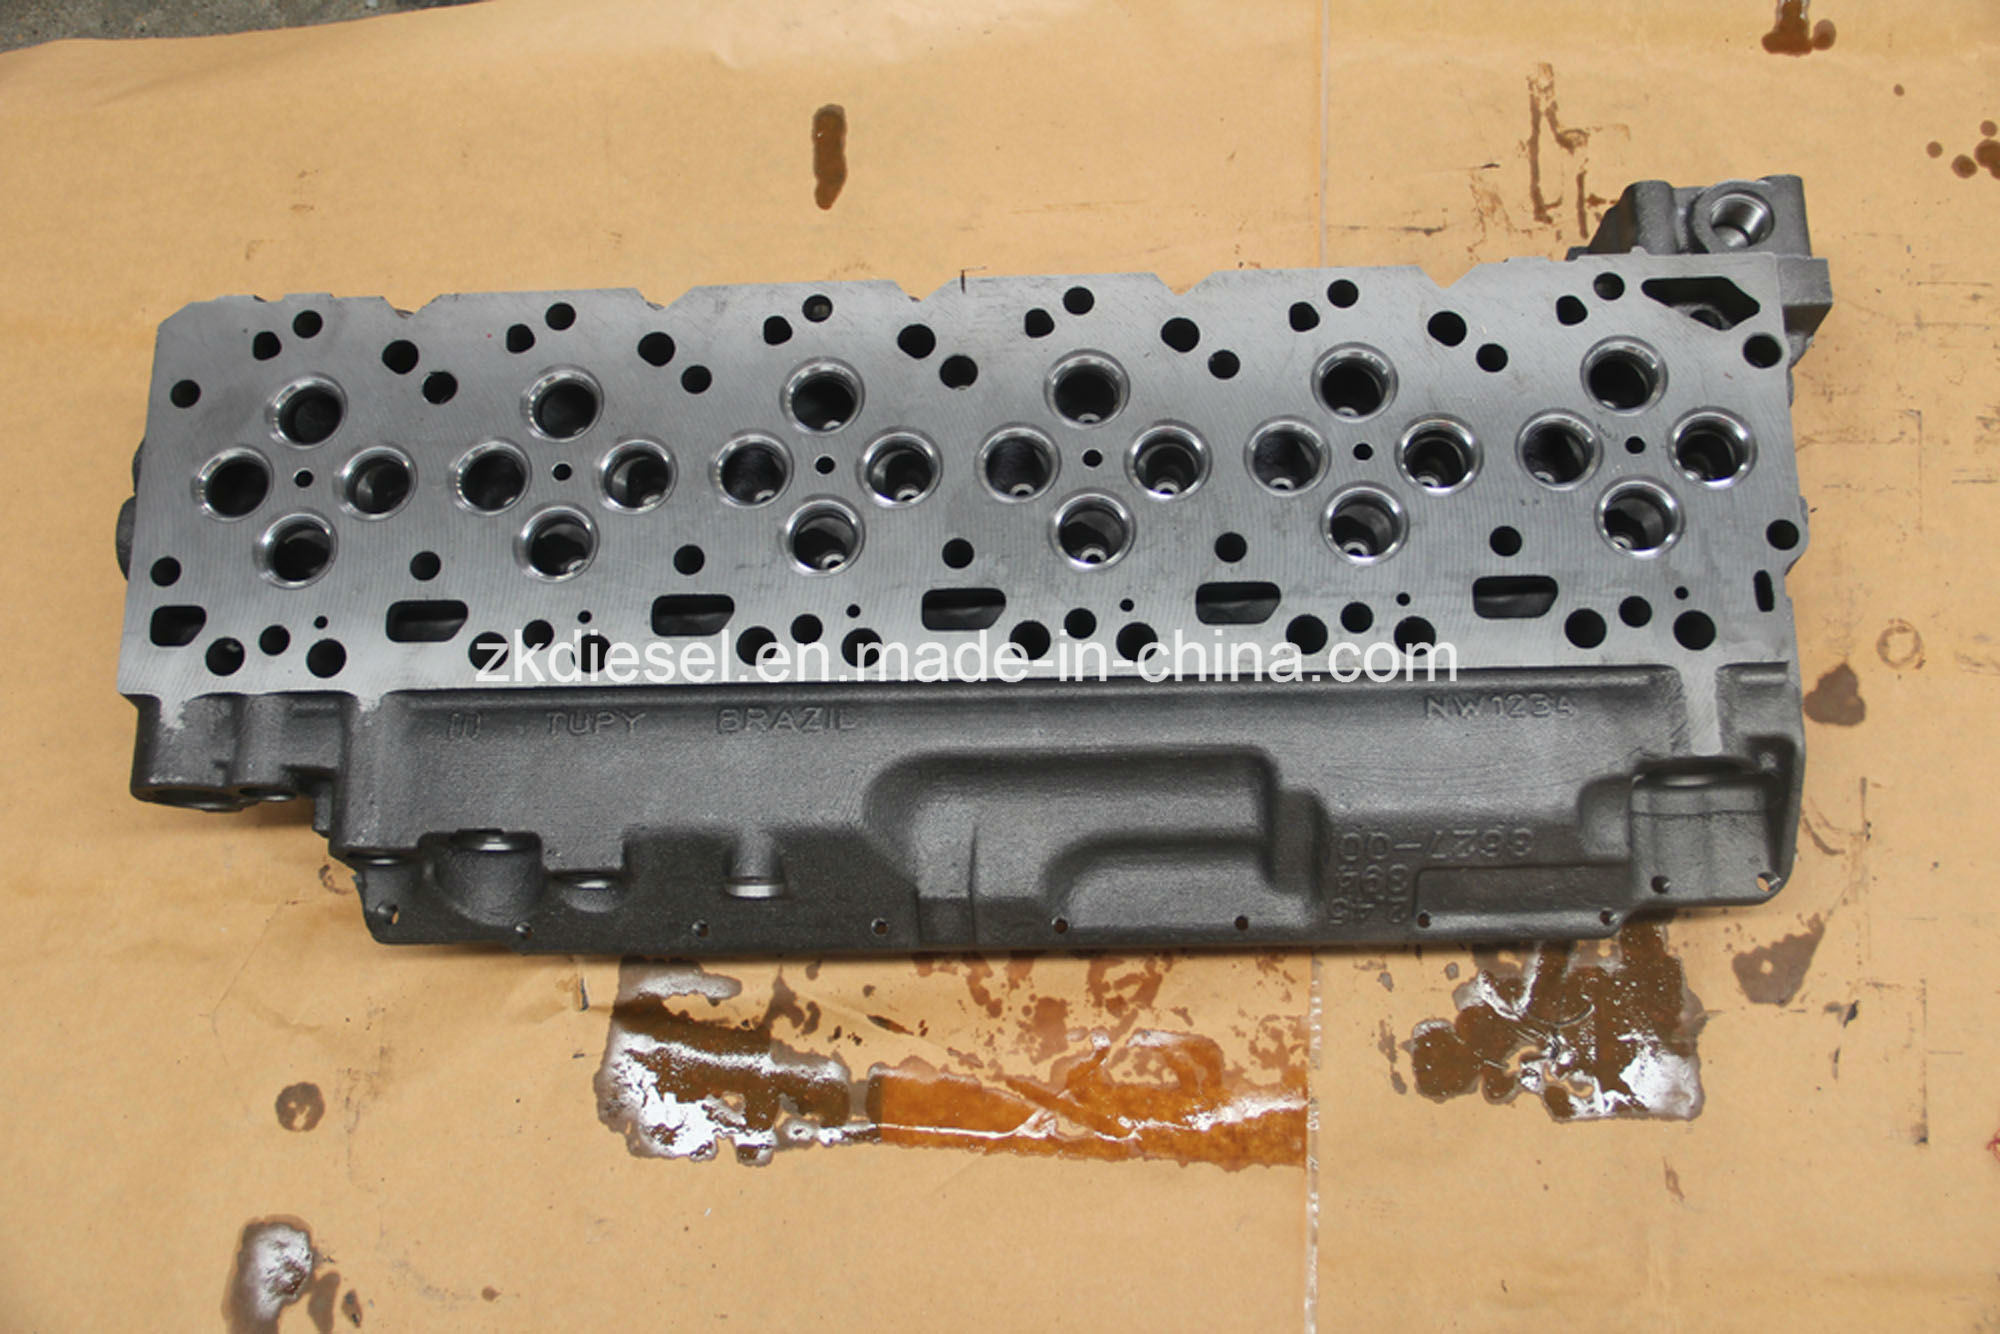 Cummins Spare Parts Isb5.9 Engine Bare Cylinder Head 3943627/3117225/2831279/2831274/3957384/3957385/5282712/3944992